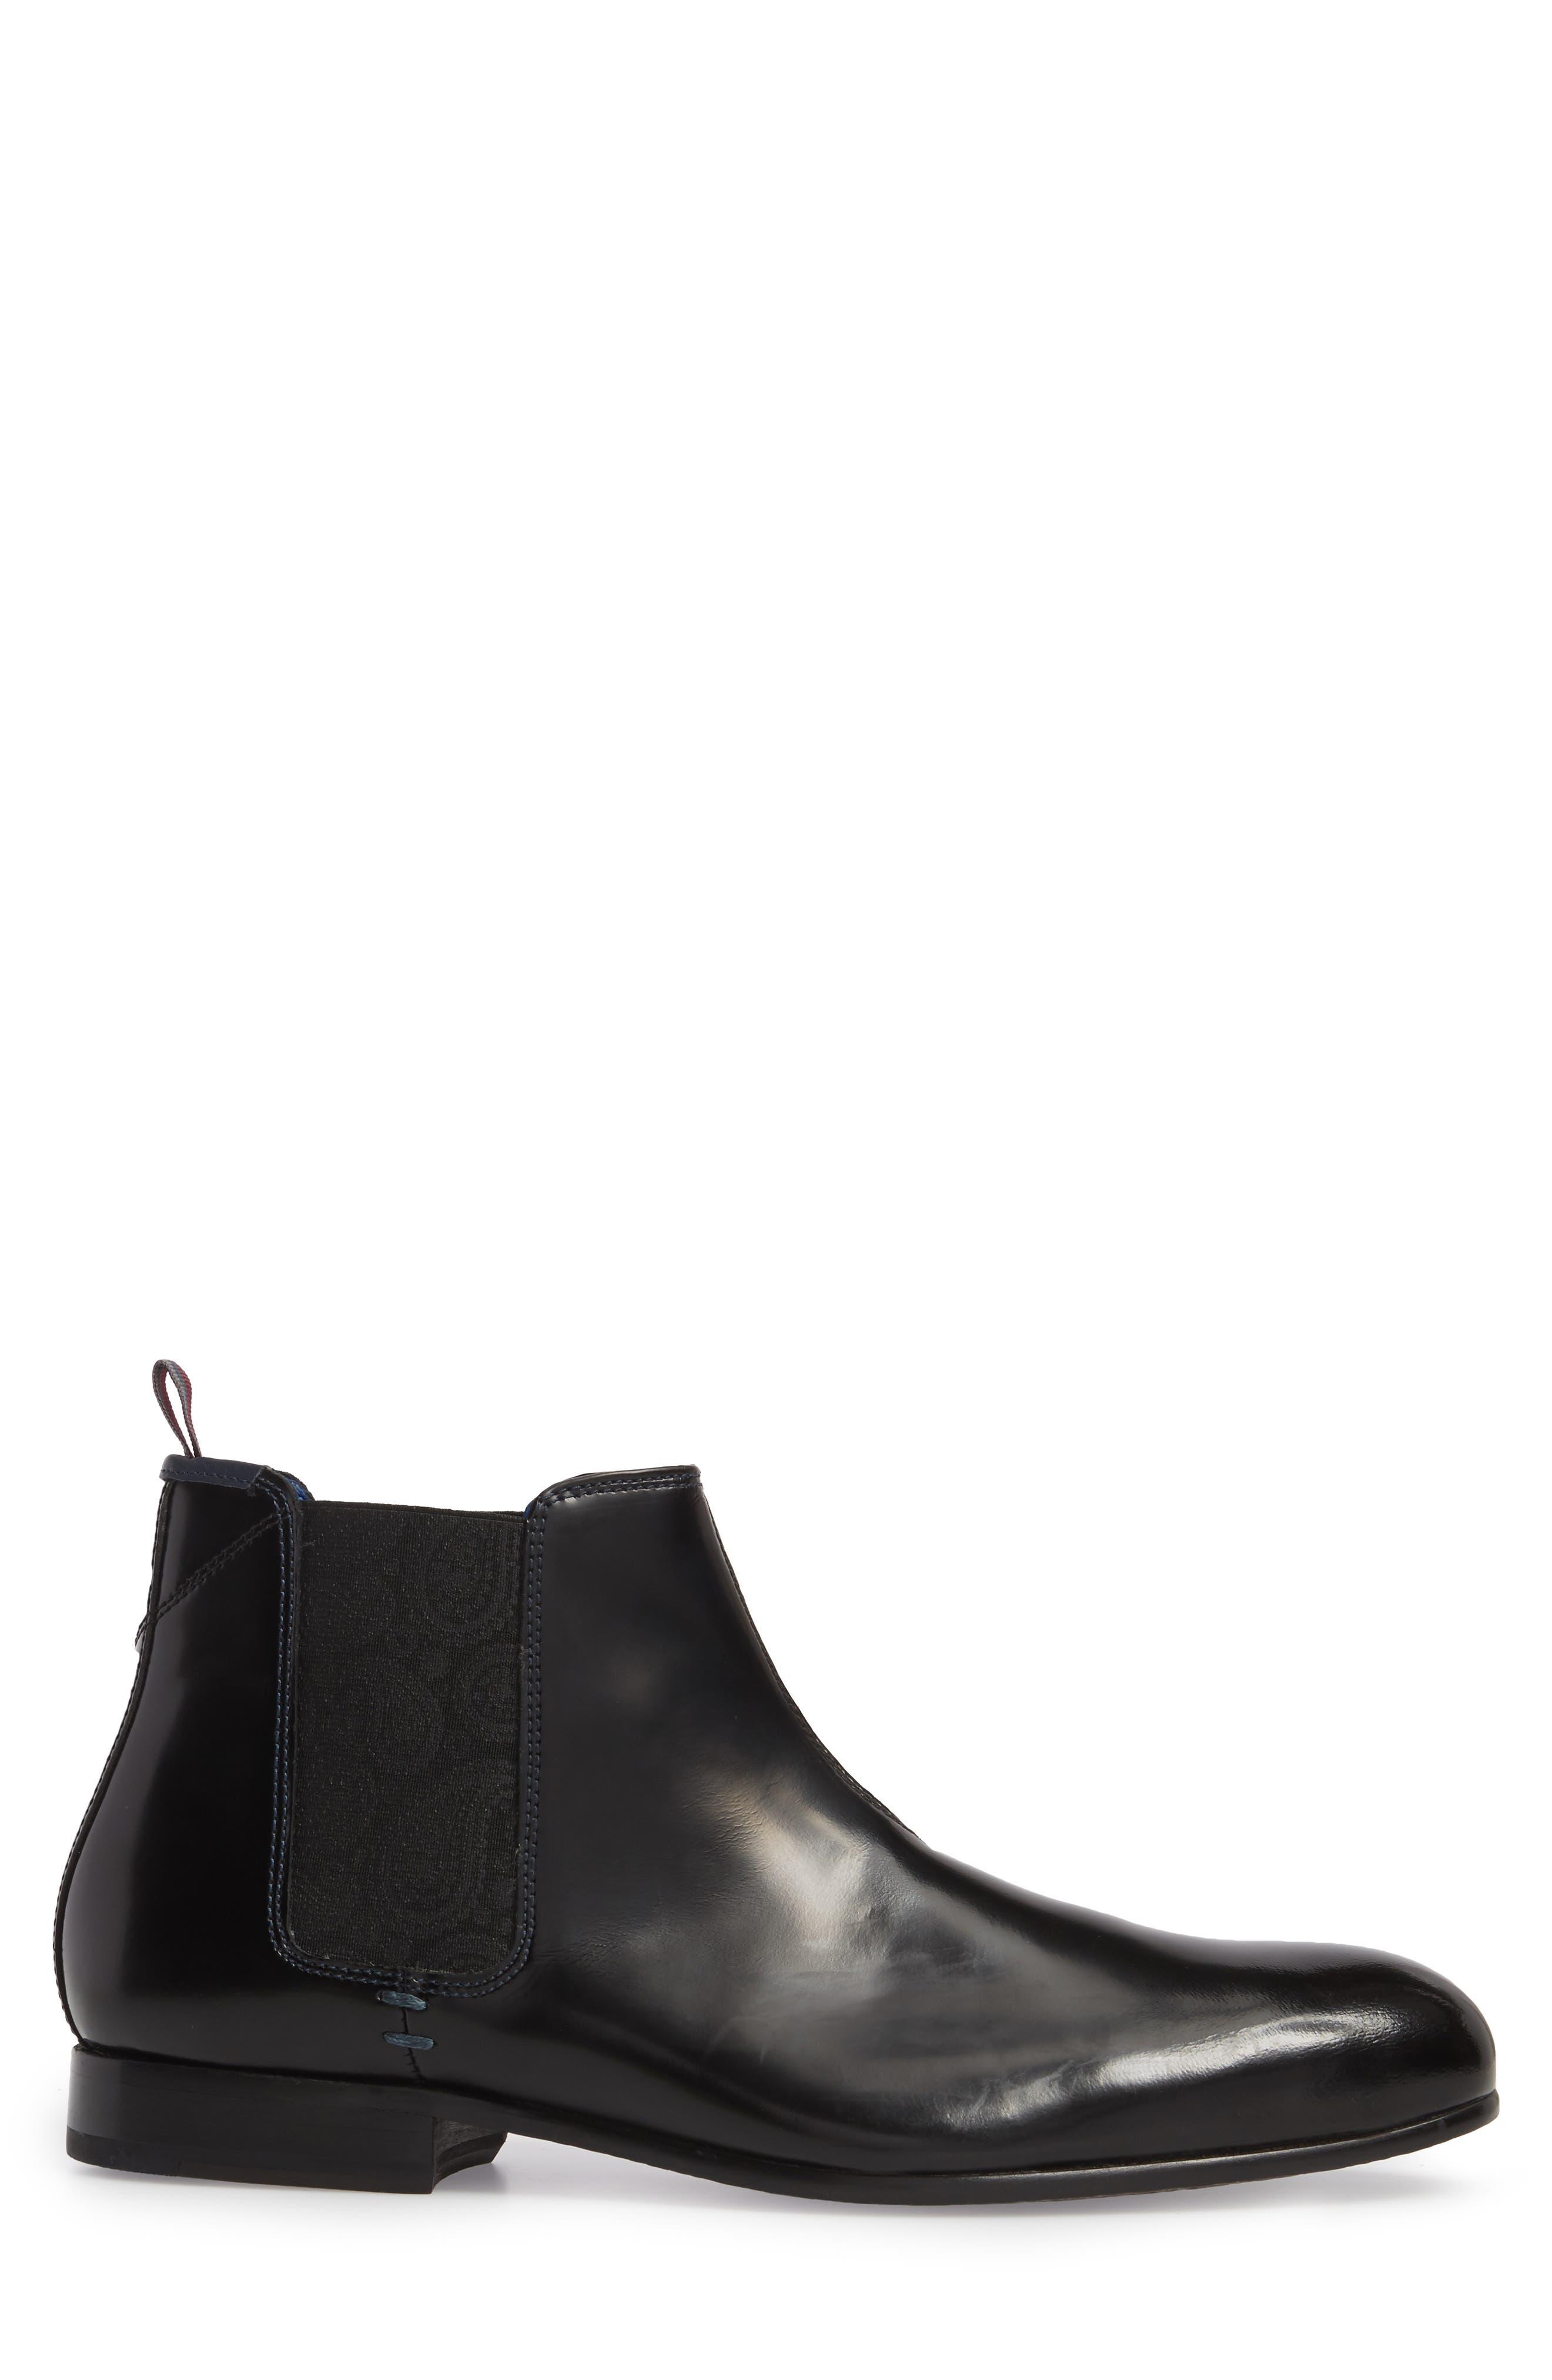 Auldham Chelsea Boot,                             Alternate thumbnail 3, color,                             Black Leather